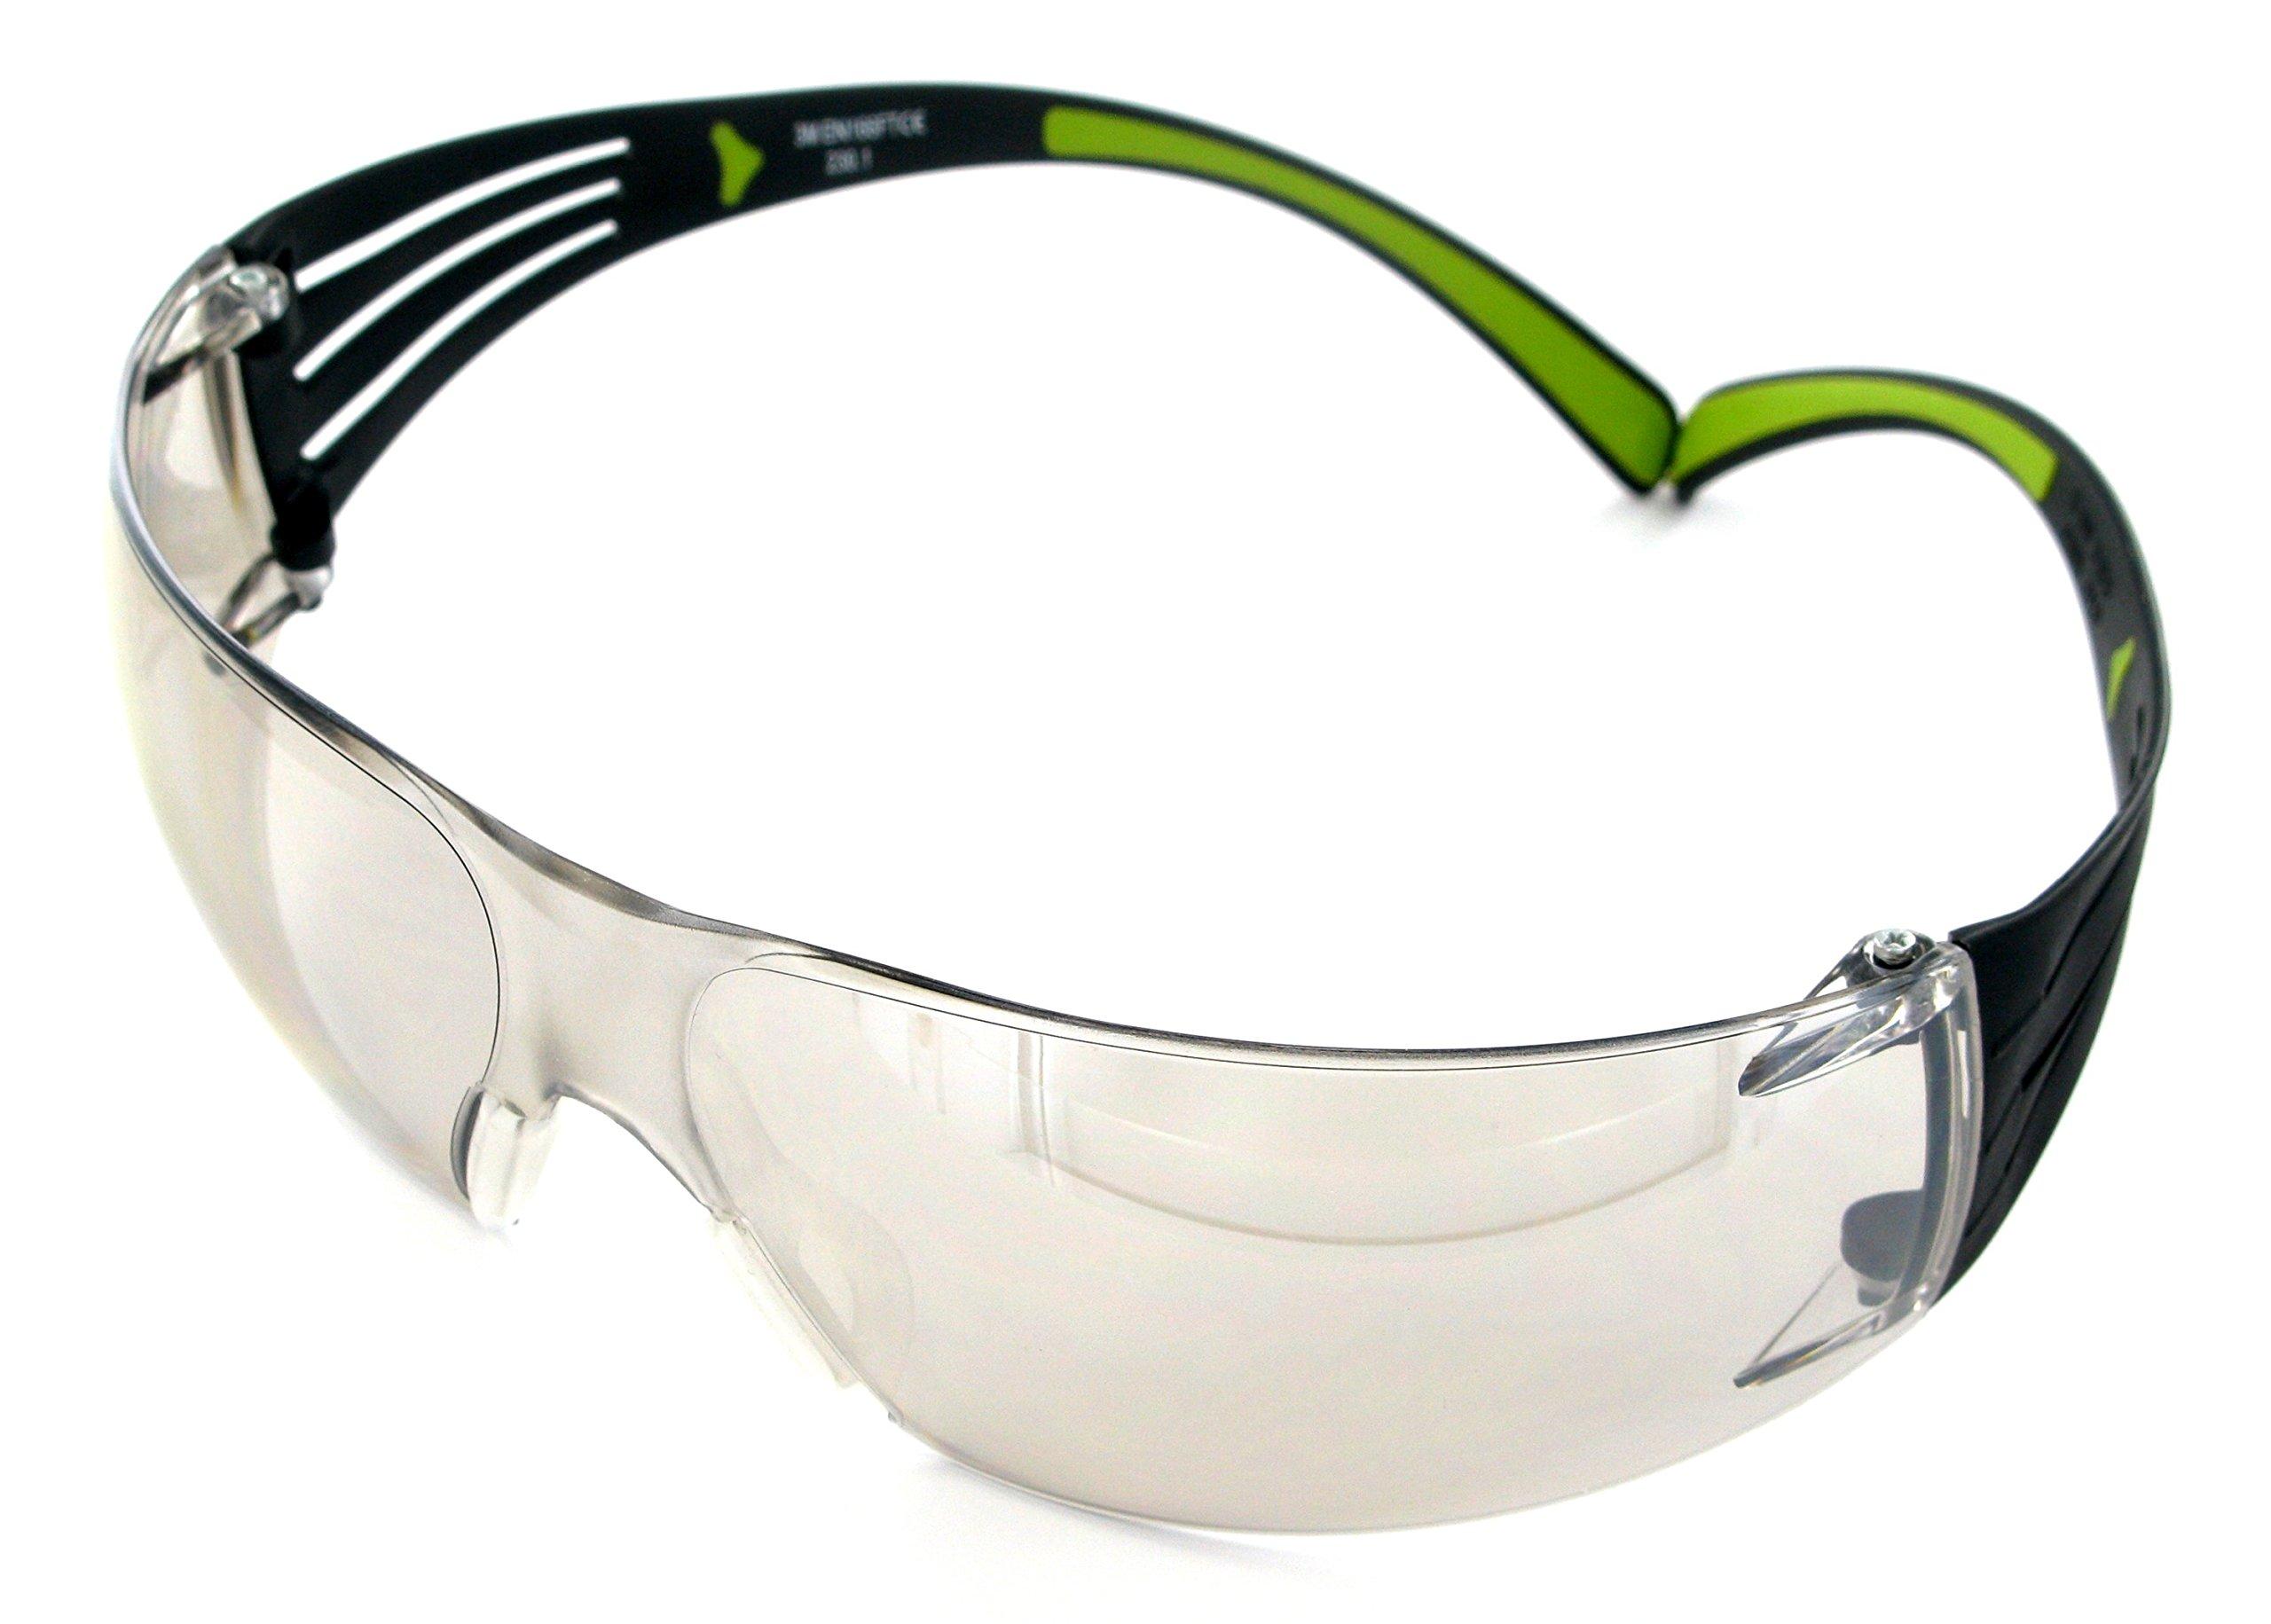 3M SF410AS Schutzbrille SecureFit, I-O verspiegelt